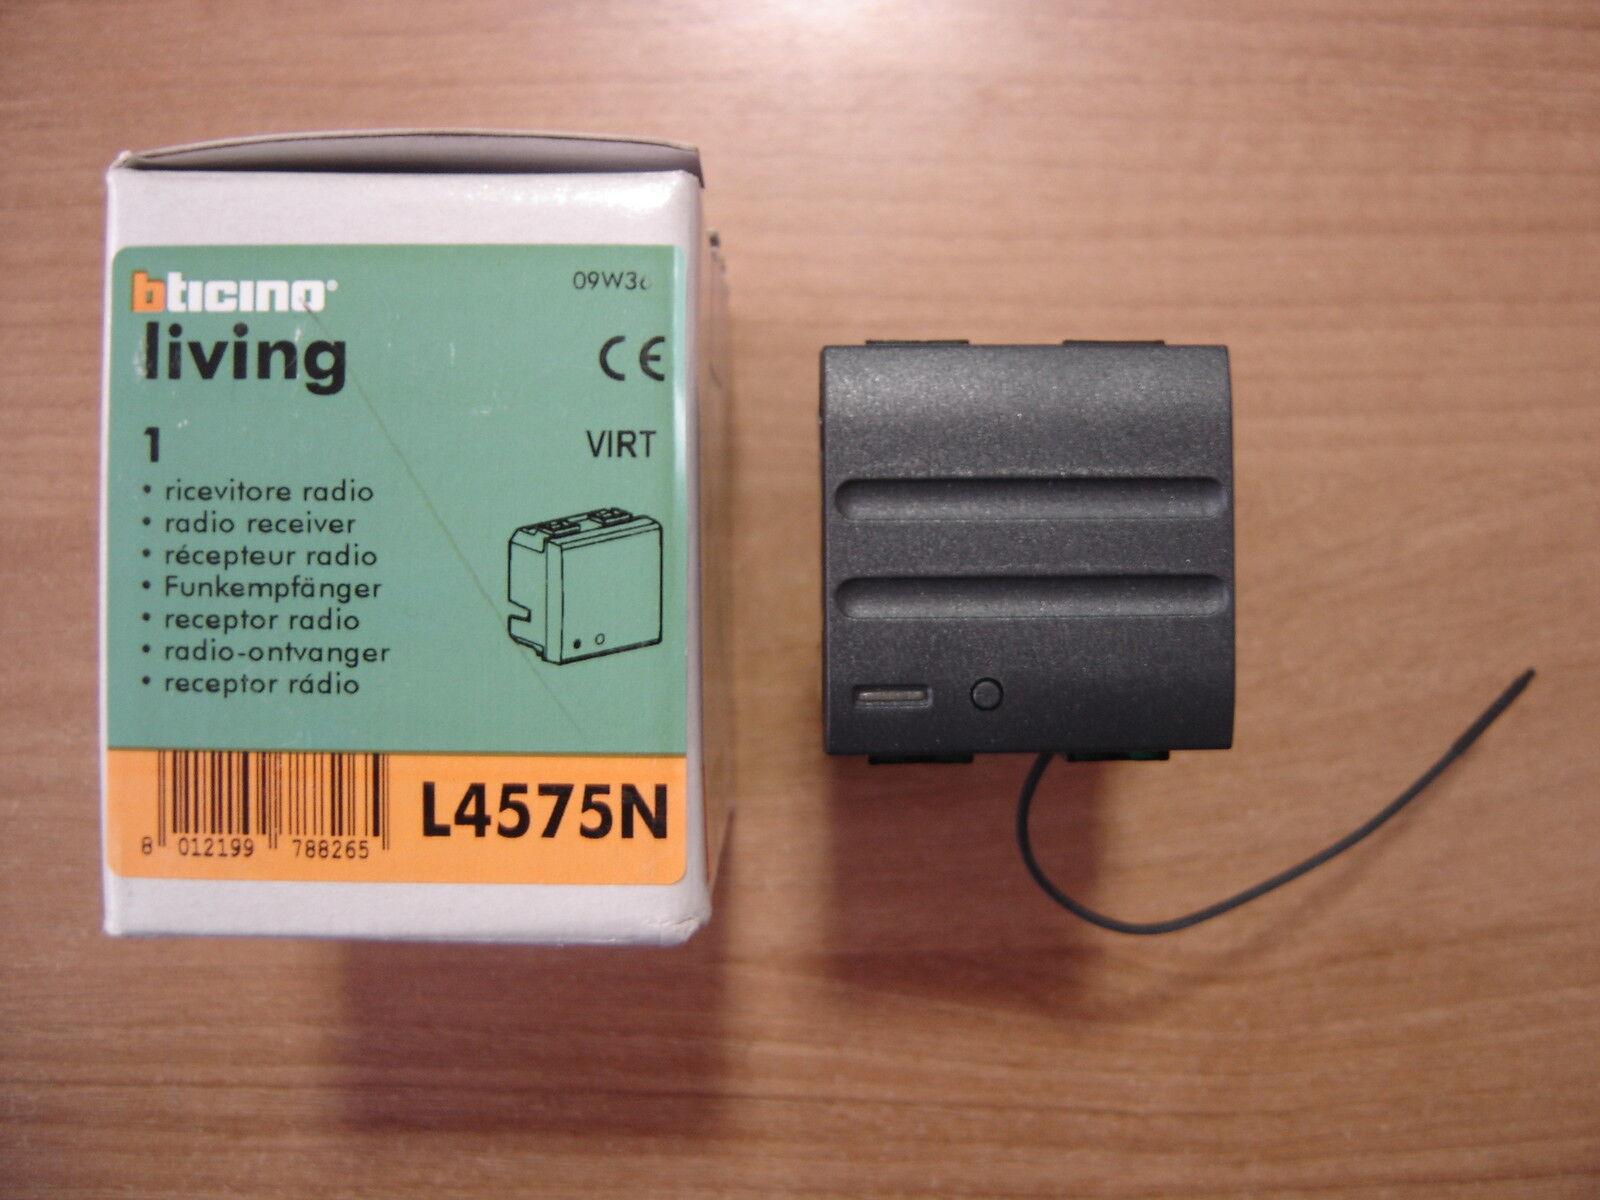 BTICINO L4575N LIVING INTERNATIONAL RICEVITORE INTERFACCIA  RADIO